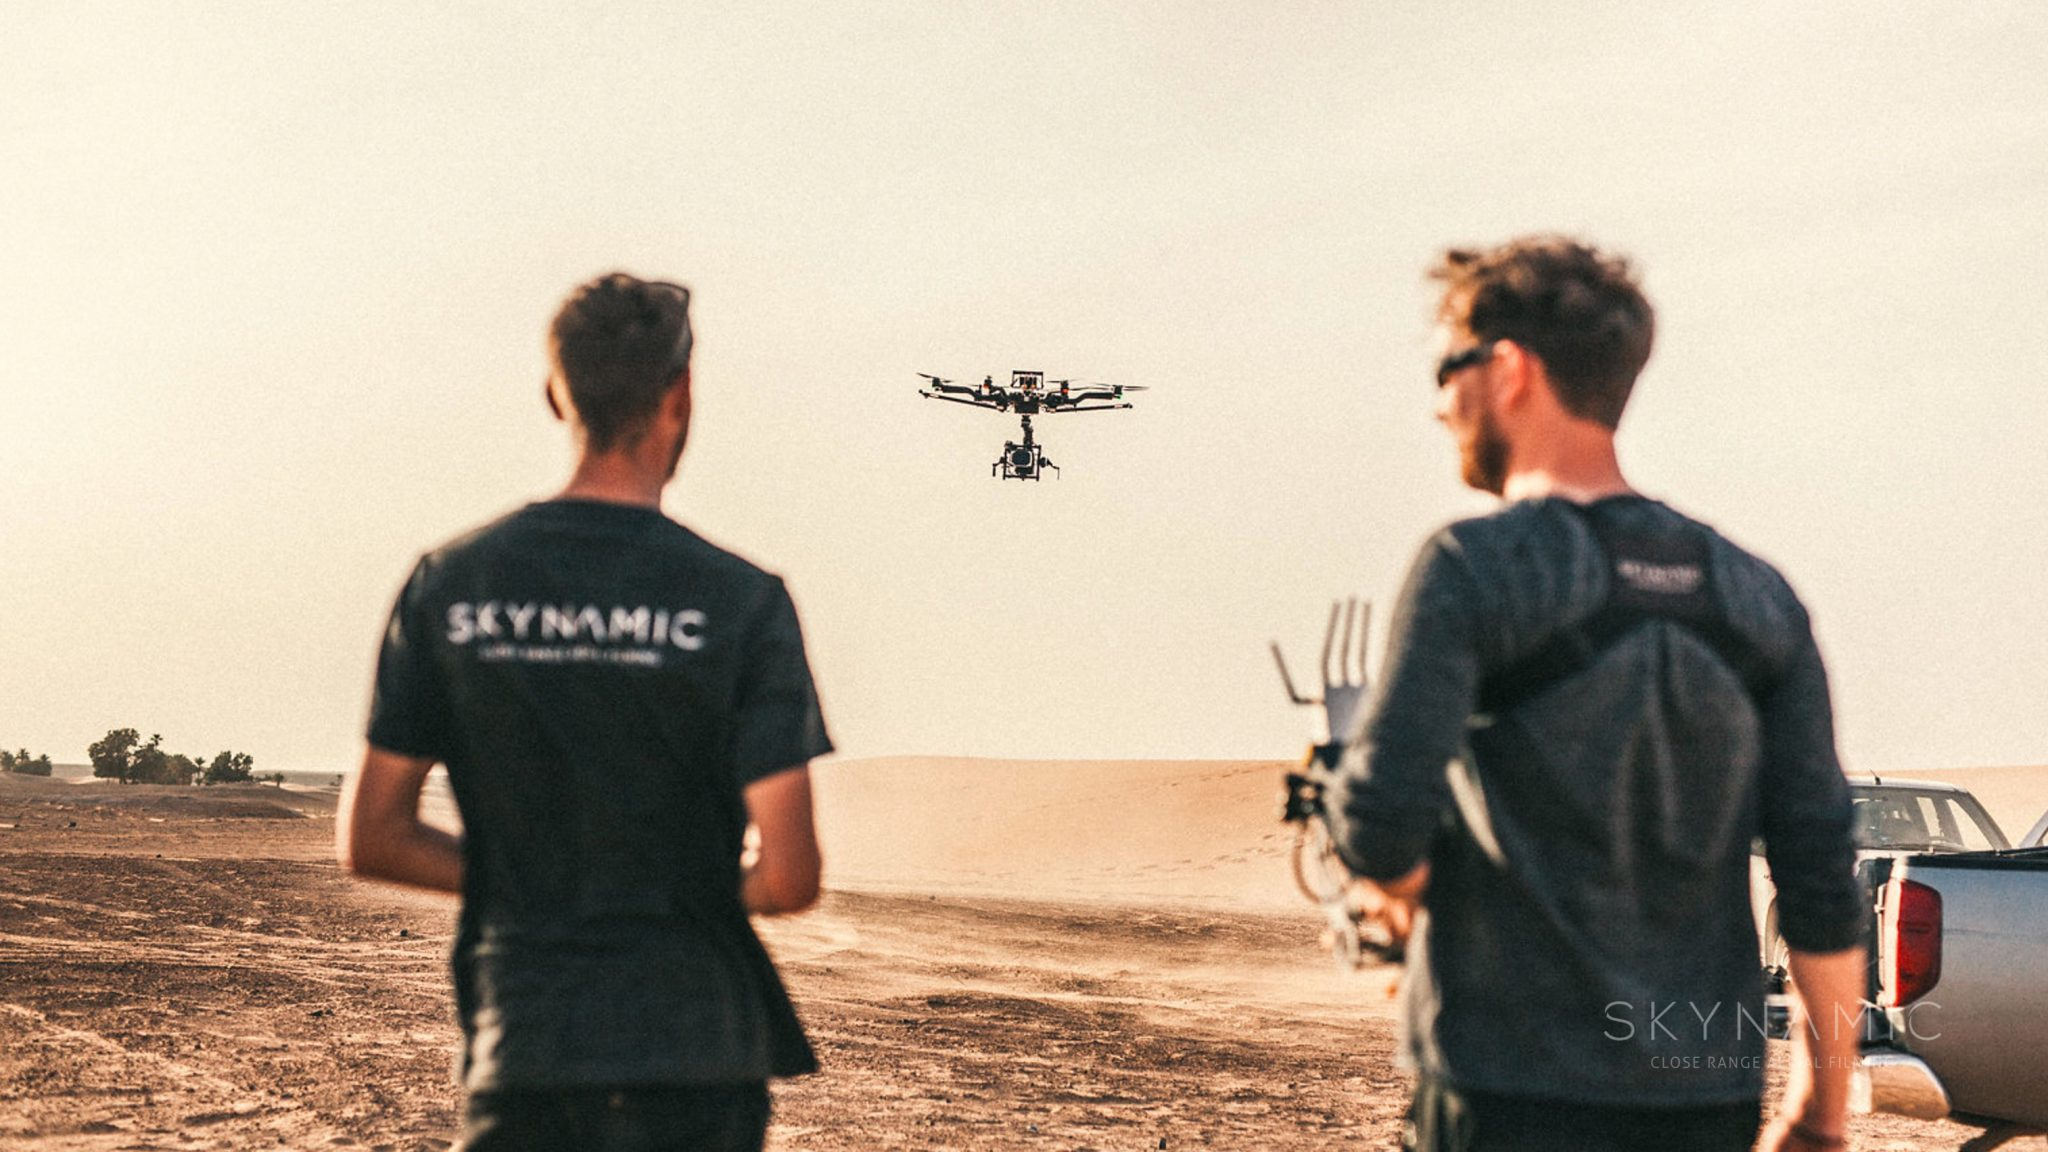 RED Drohne Alexa Mini Drone Team